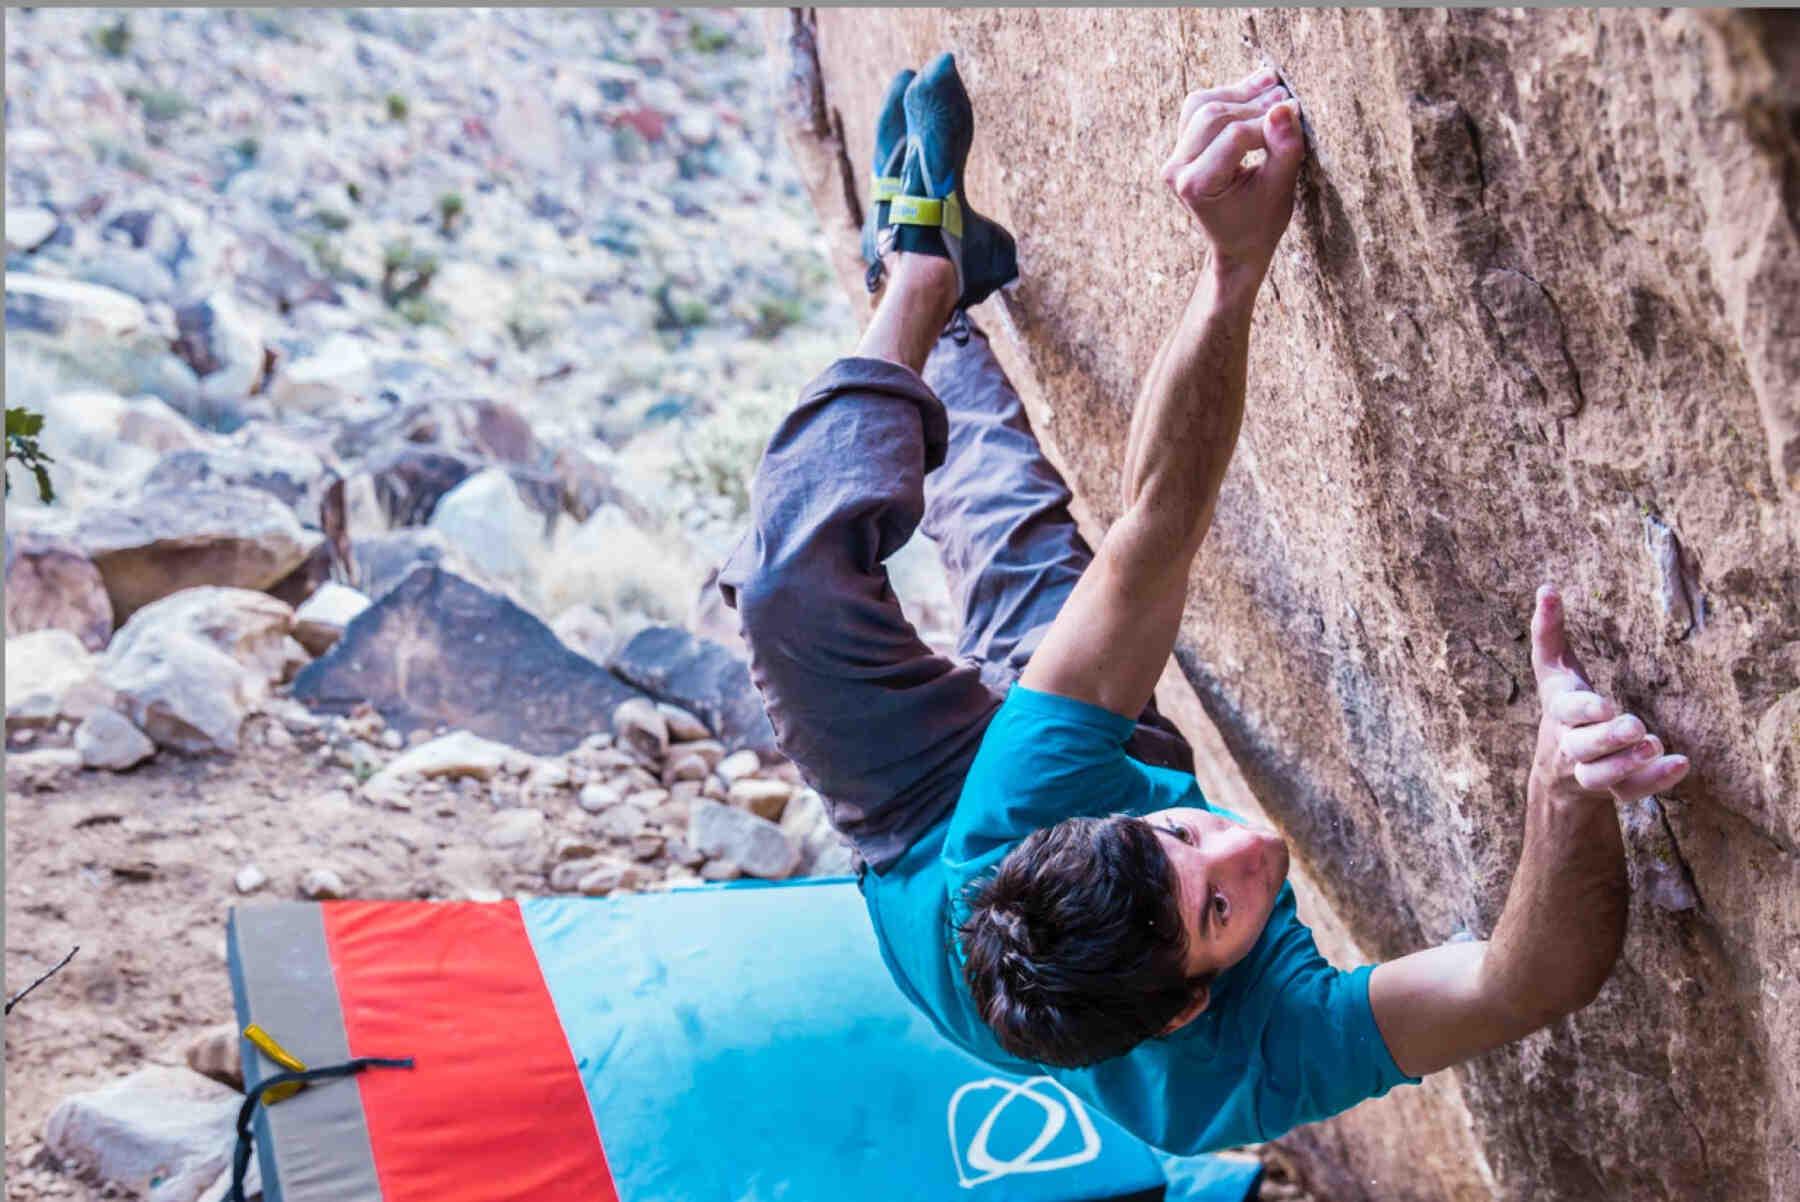 Paul Robinson - FrictionLabs Rock Climbing Chalk Pro Athlete